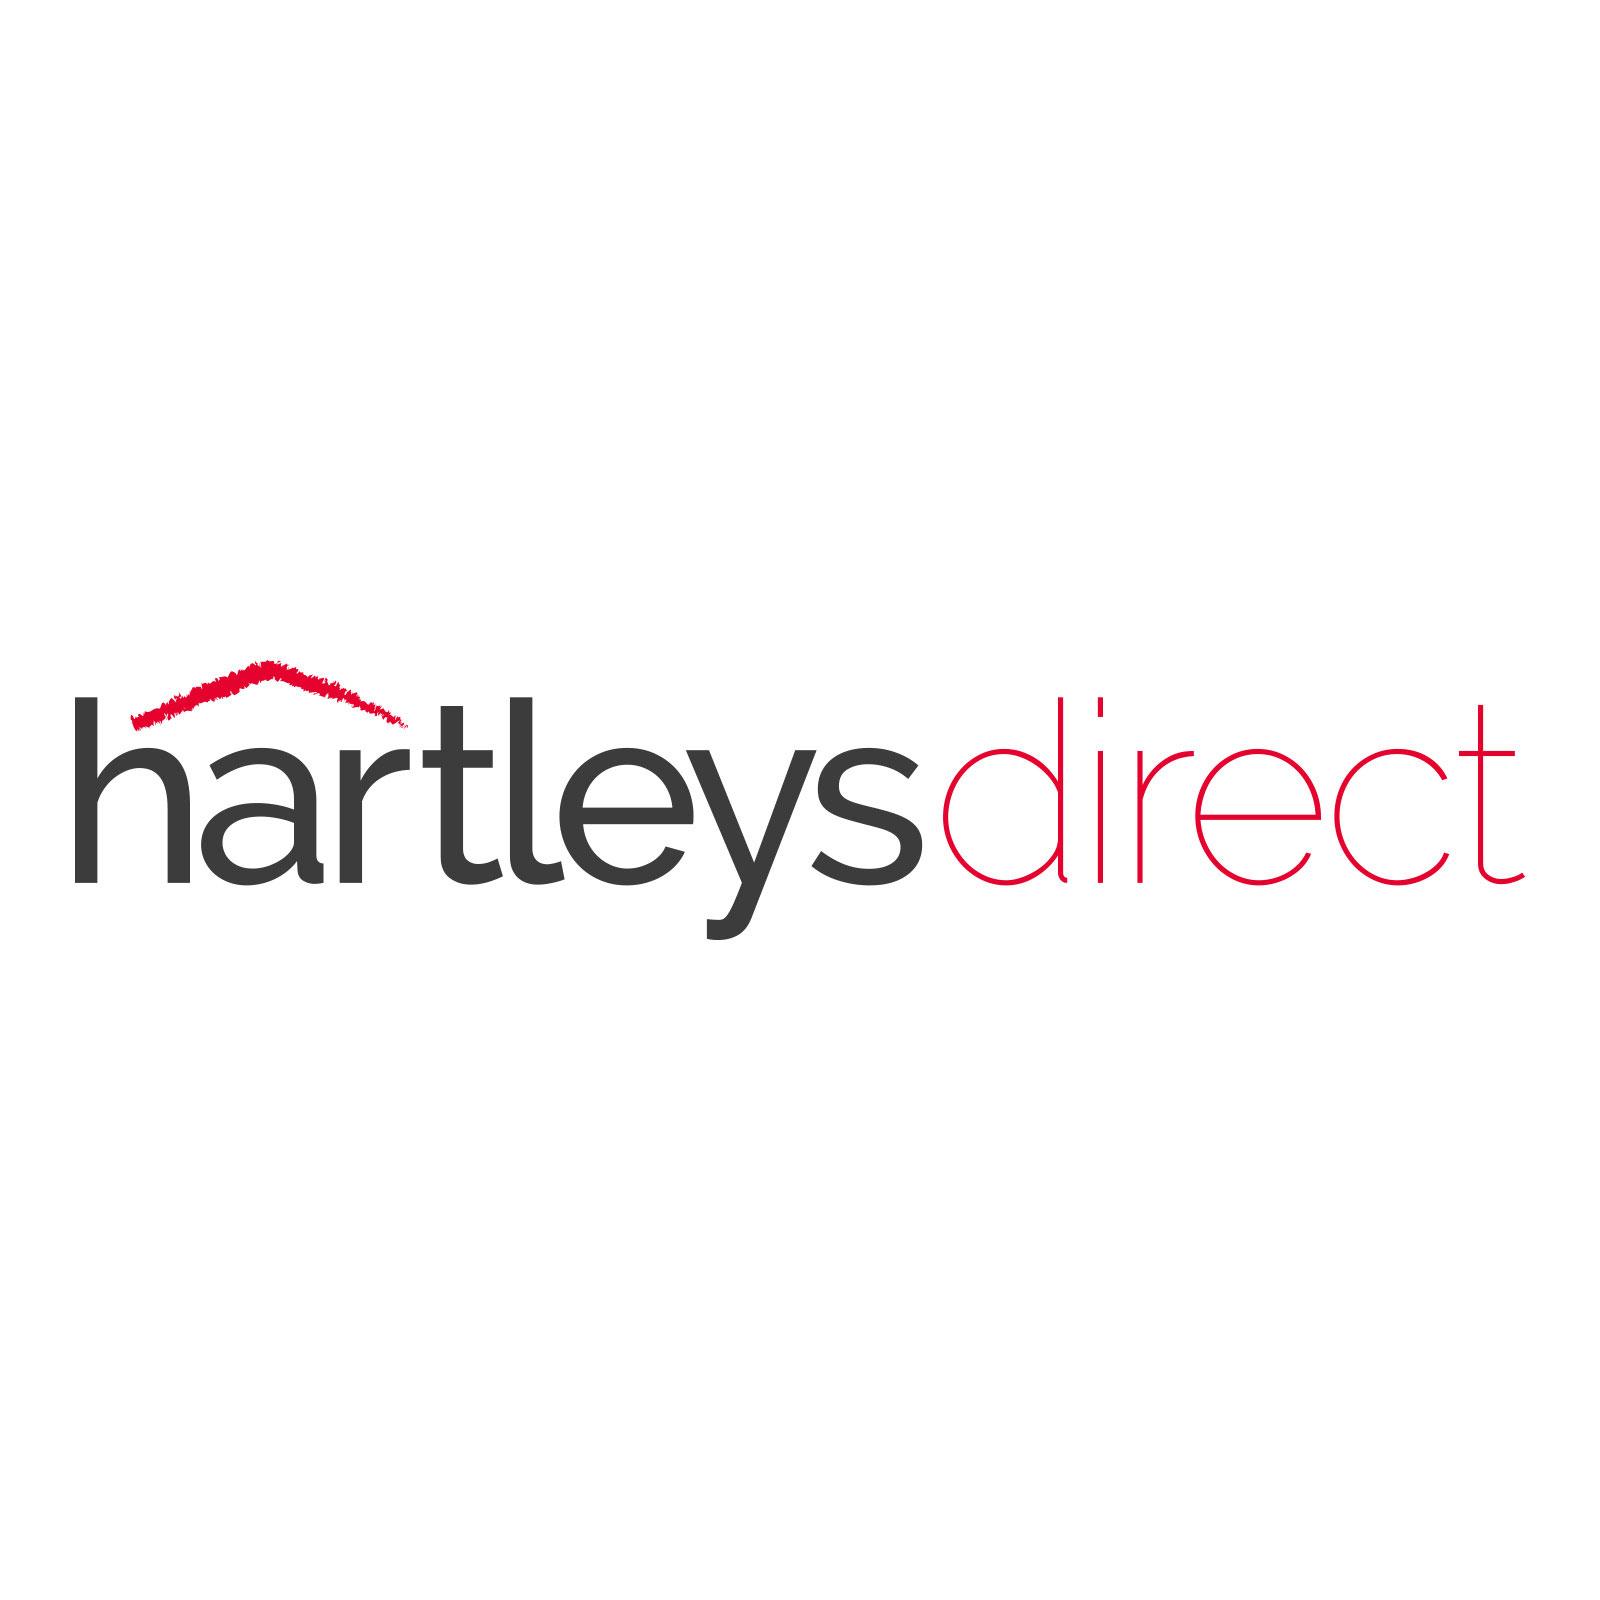 Hartleys-Japanese-Room-Dividers-on-a-White-Background.jpg